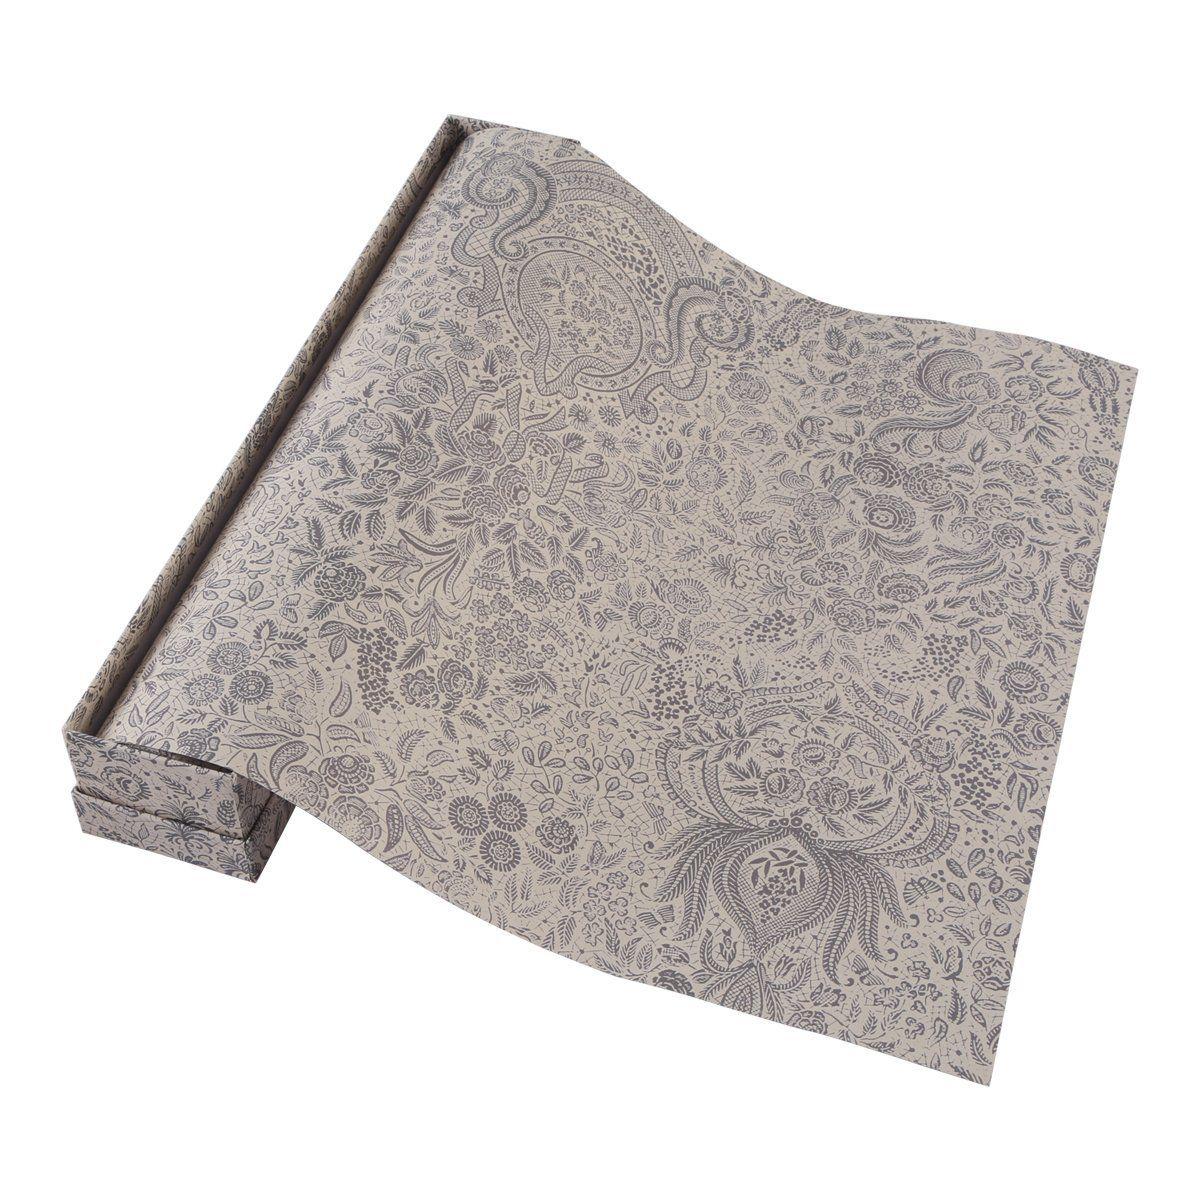 Neoviva Lavender Scented Drawer Paper Gift Box Pack Of 6 Sheets Floral Vintage Garden More Forbidden Discounts A Drawer Liner Drawer Paper Lavender Scent